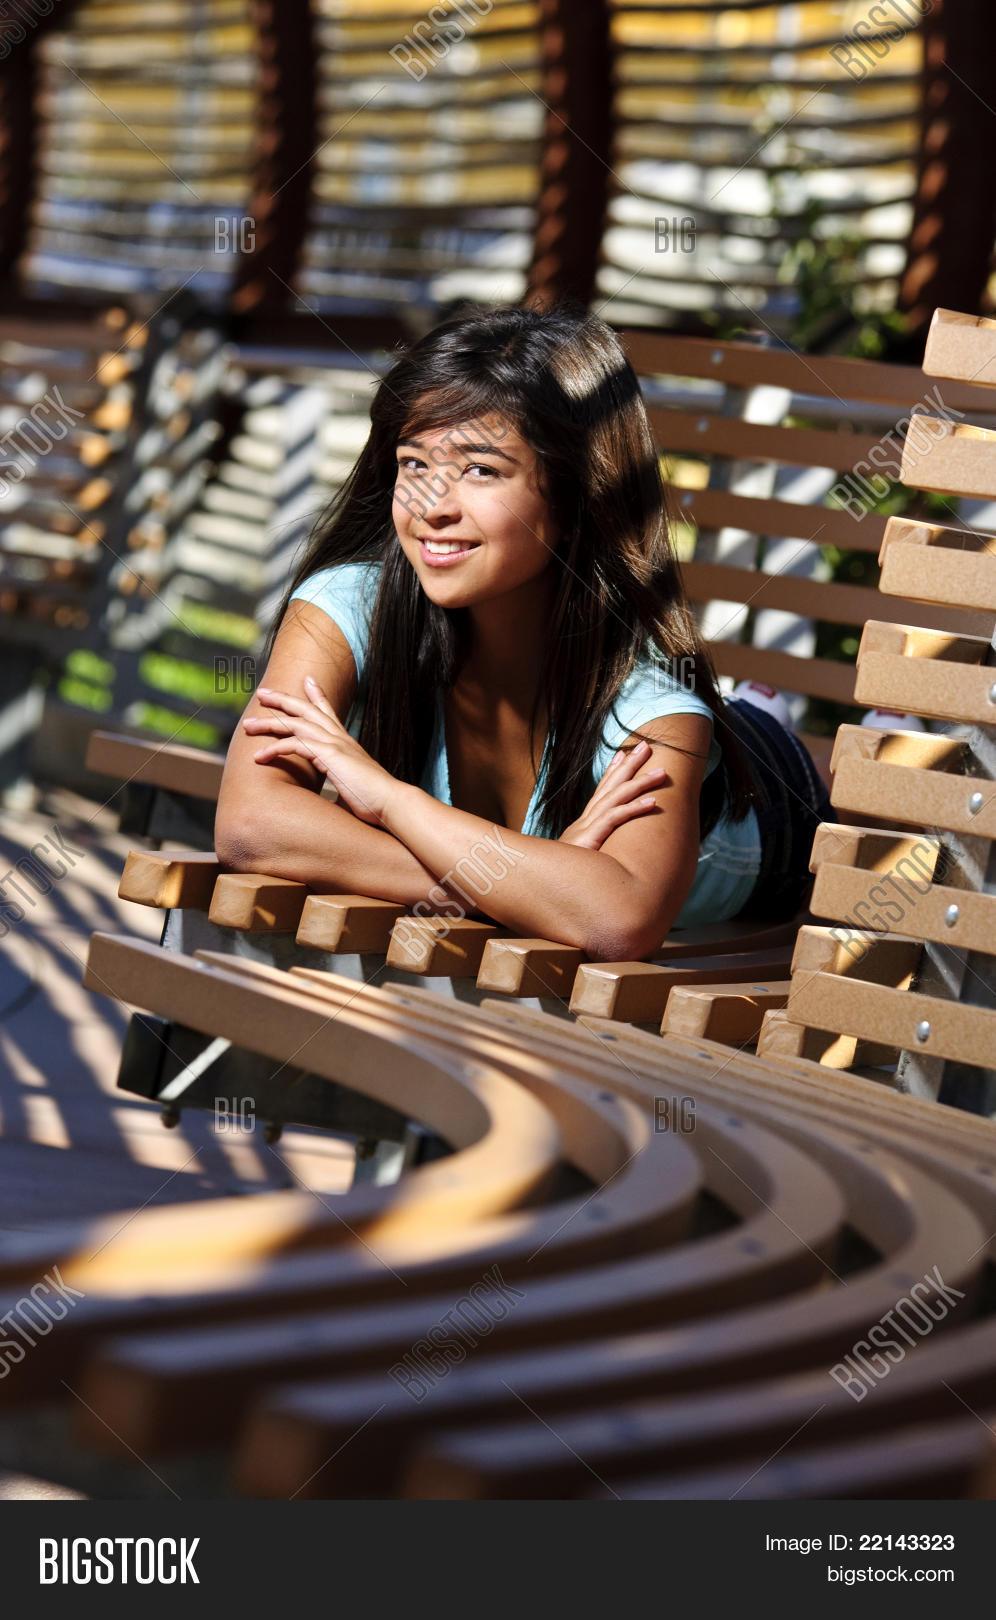 Teenage Model Image & Photo (Free Trial) | Bigstock